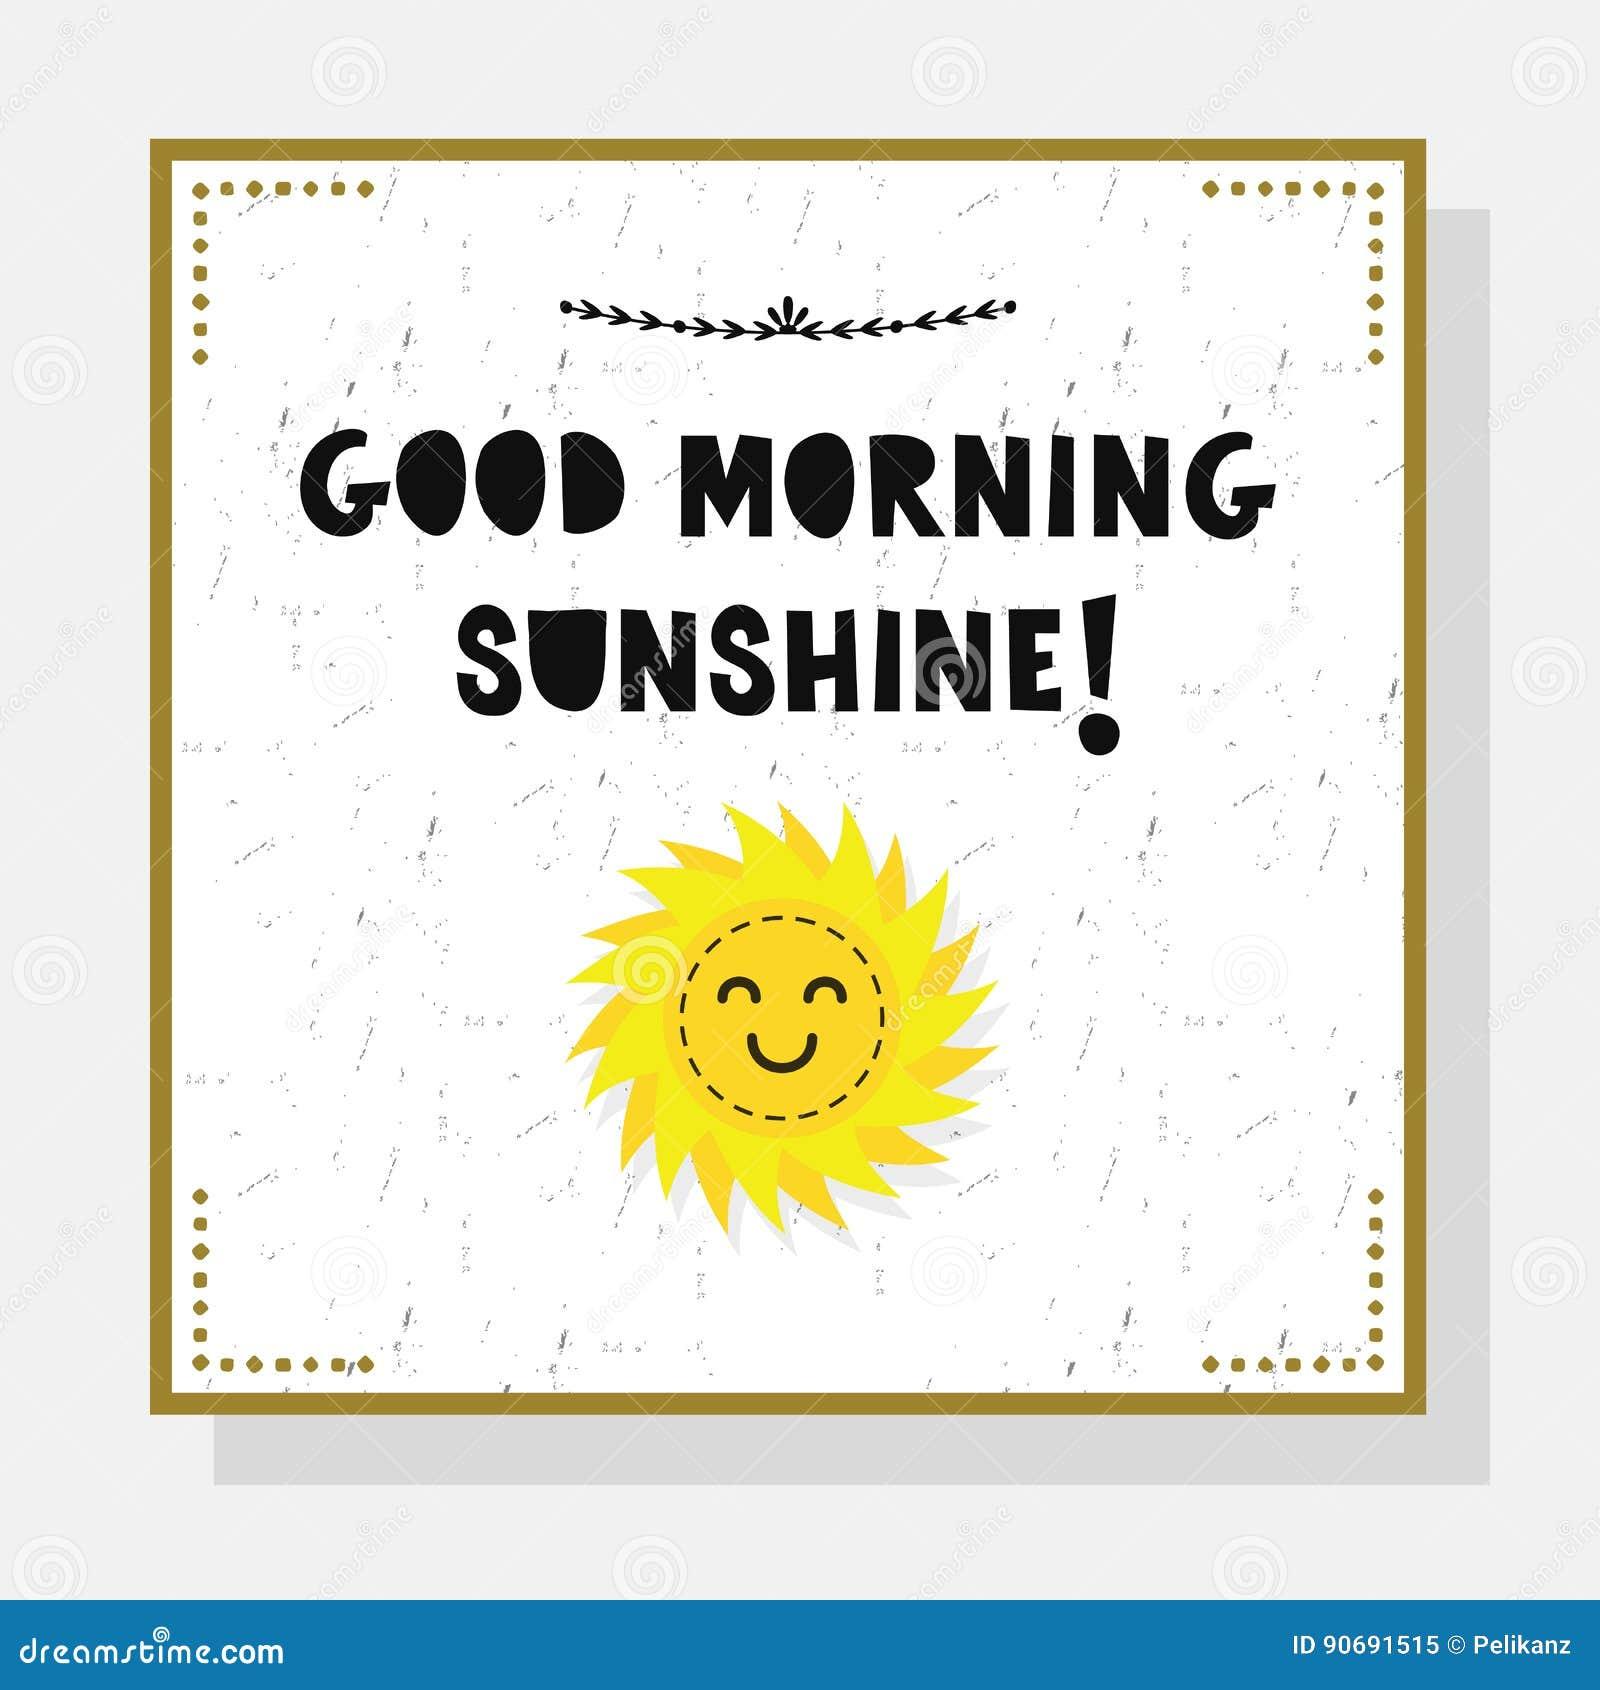 Good Morning Sunshine Words : Cute good morning sunshine greeting card with sun emoji